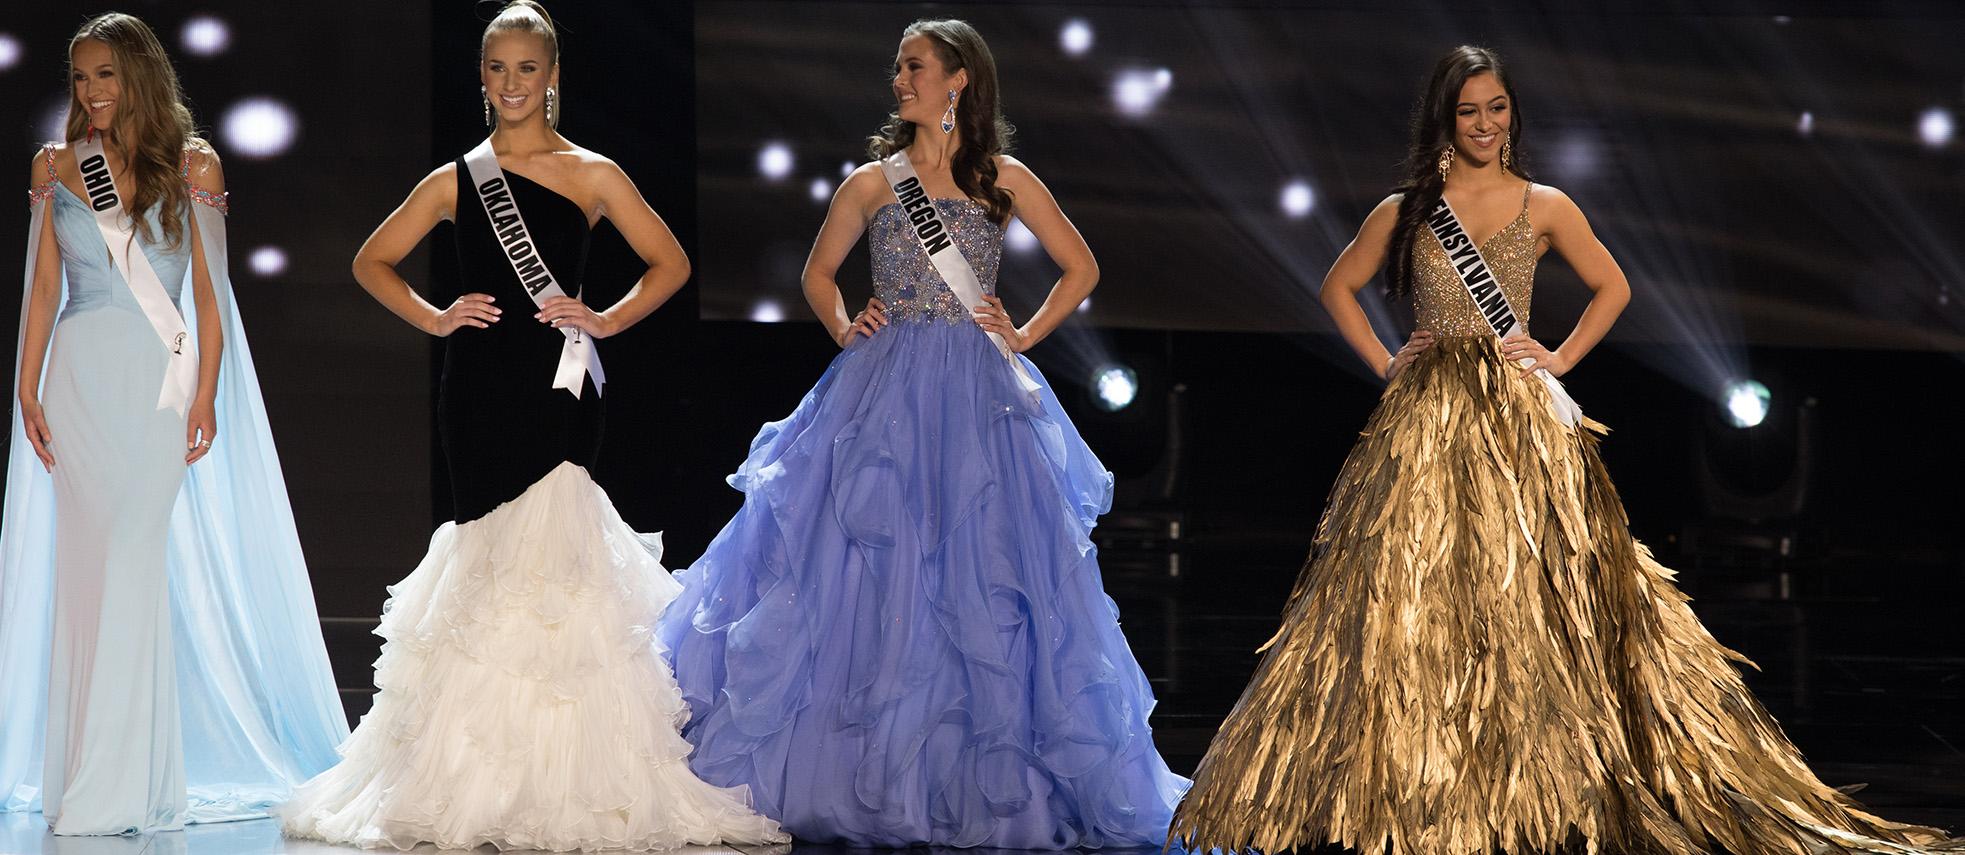 Miss Oregon USA